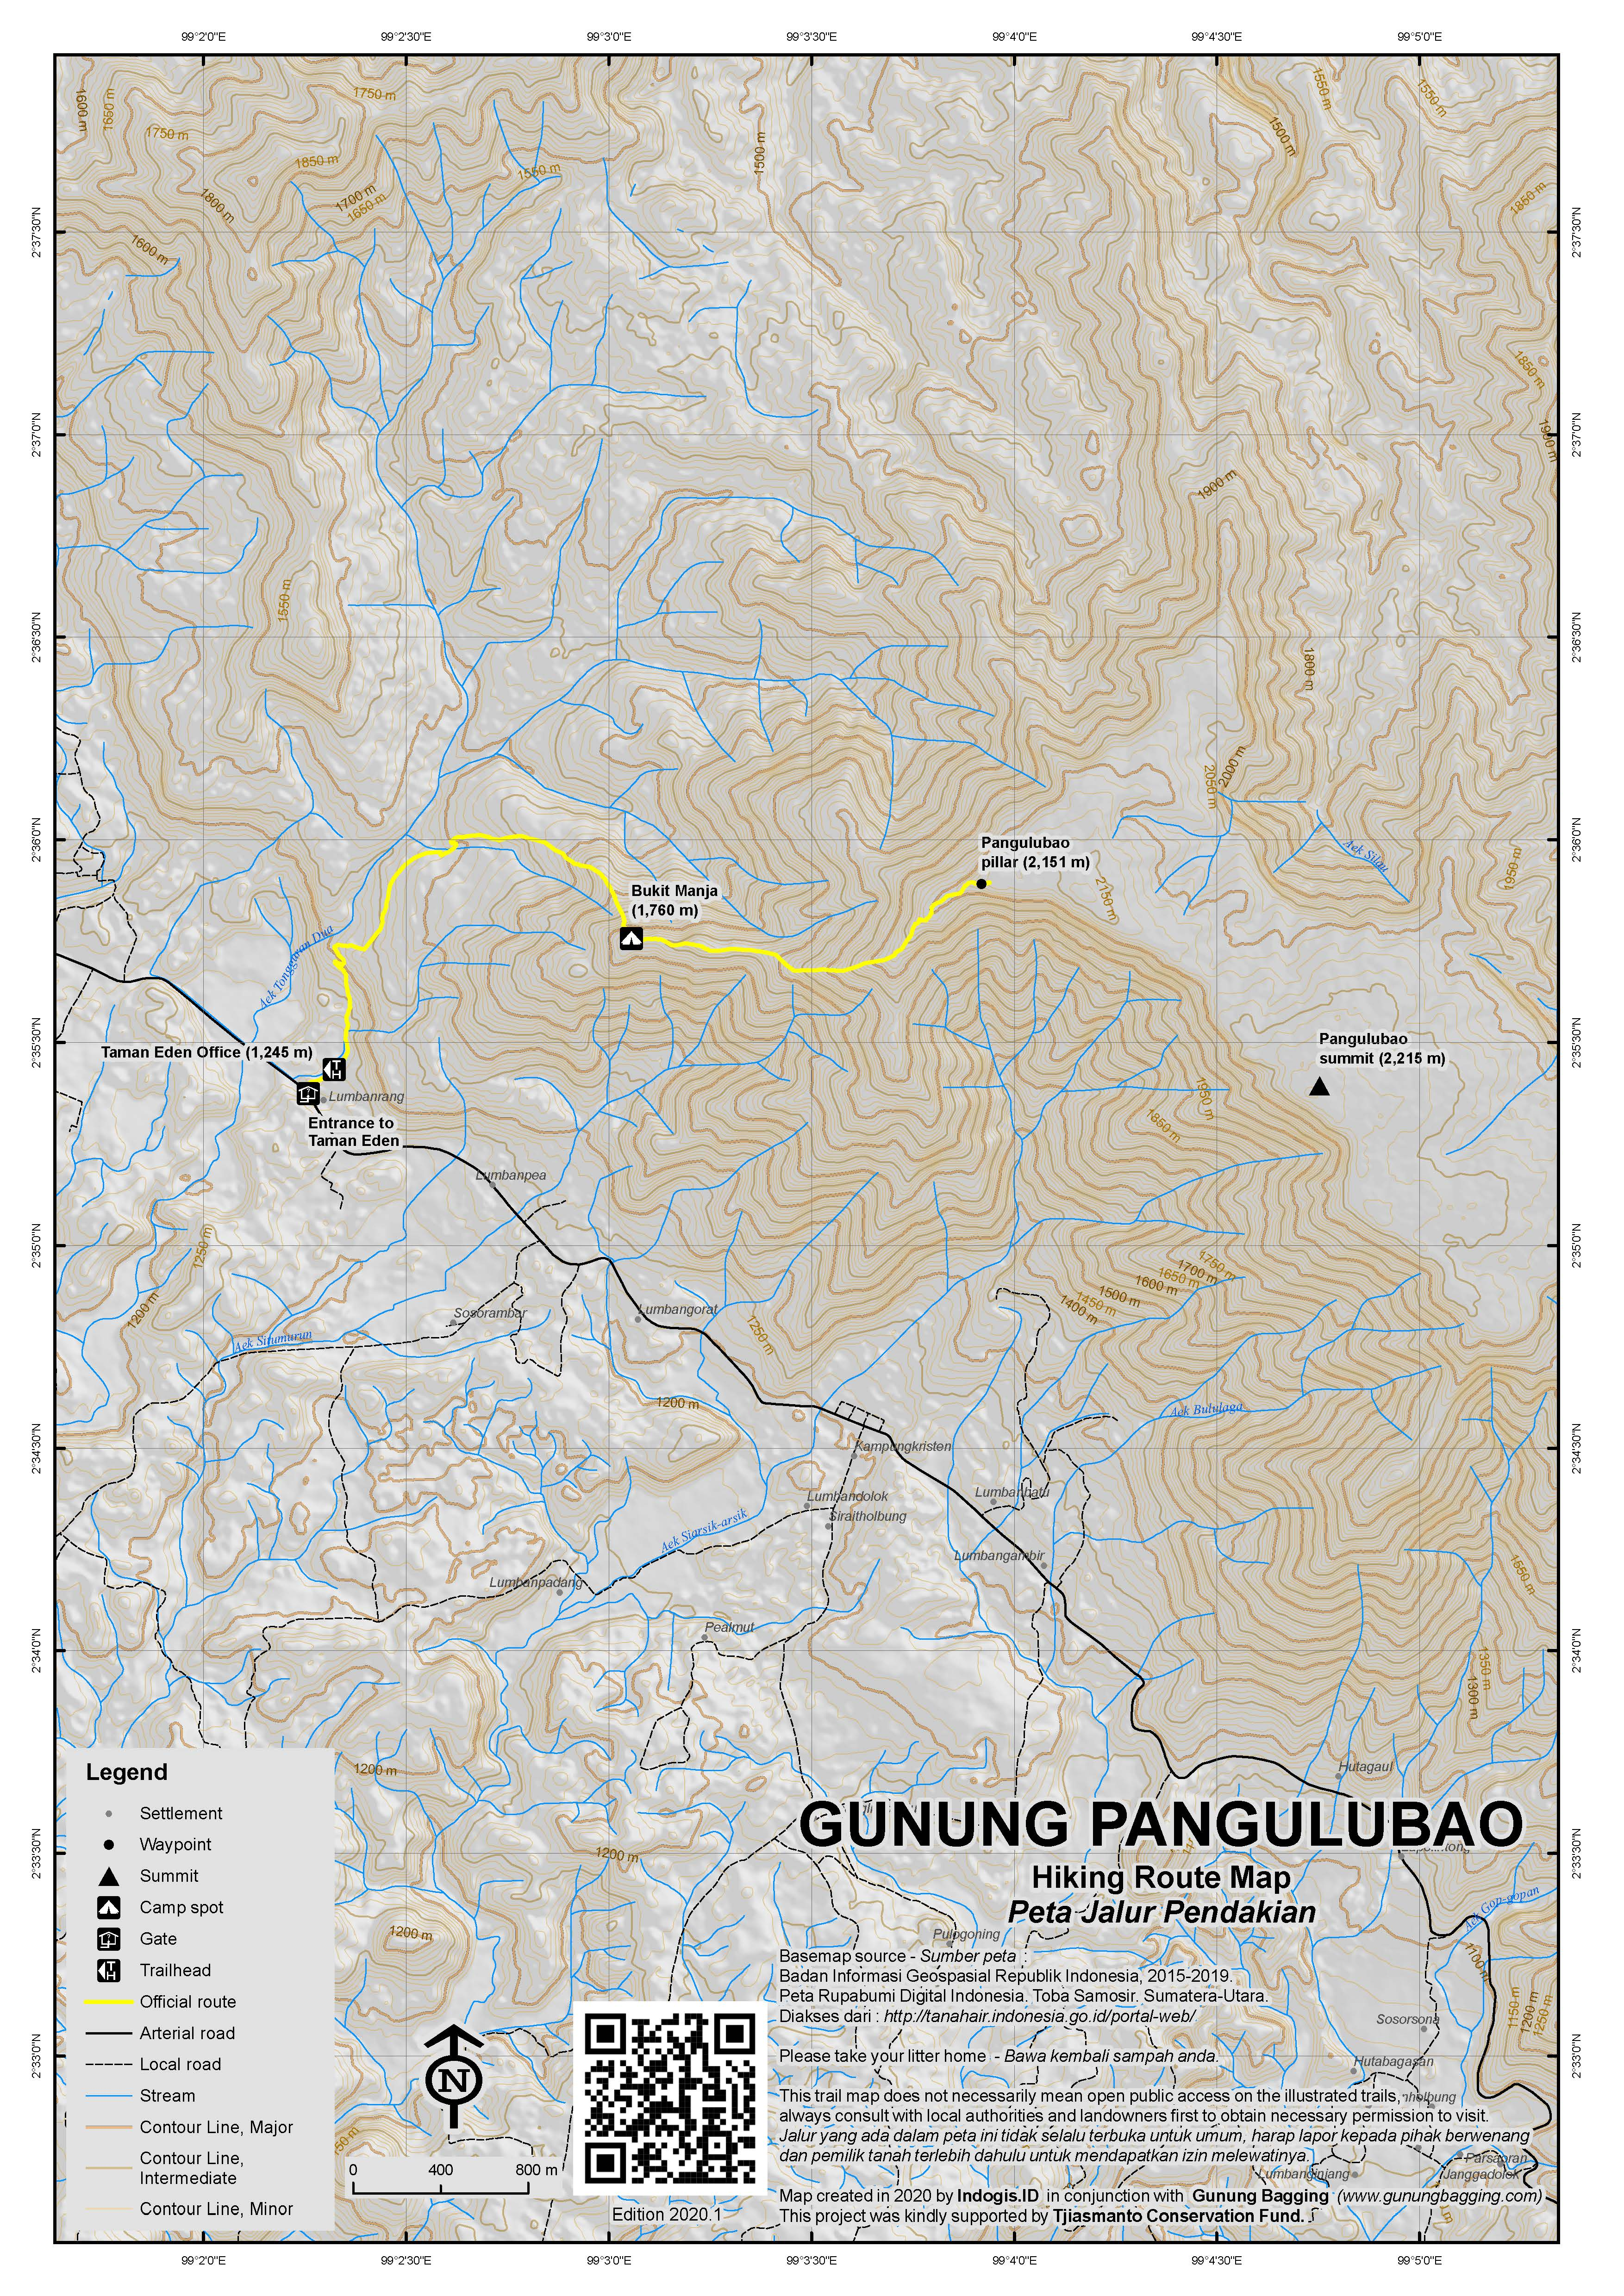 Peta Jalur Pendakian Gunung Pangulubao